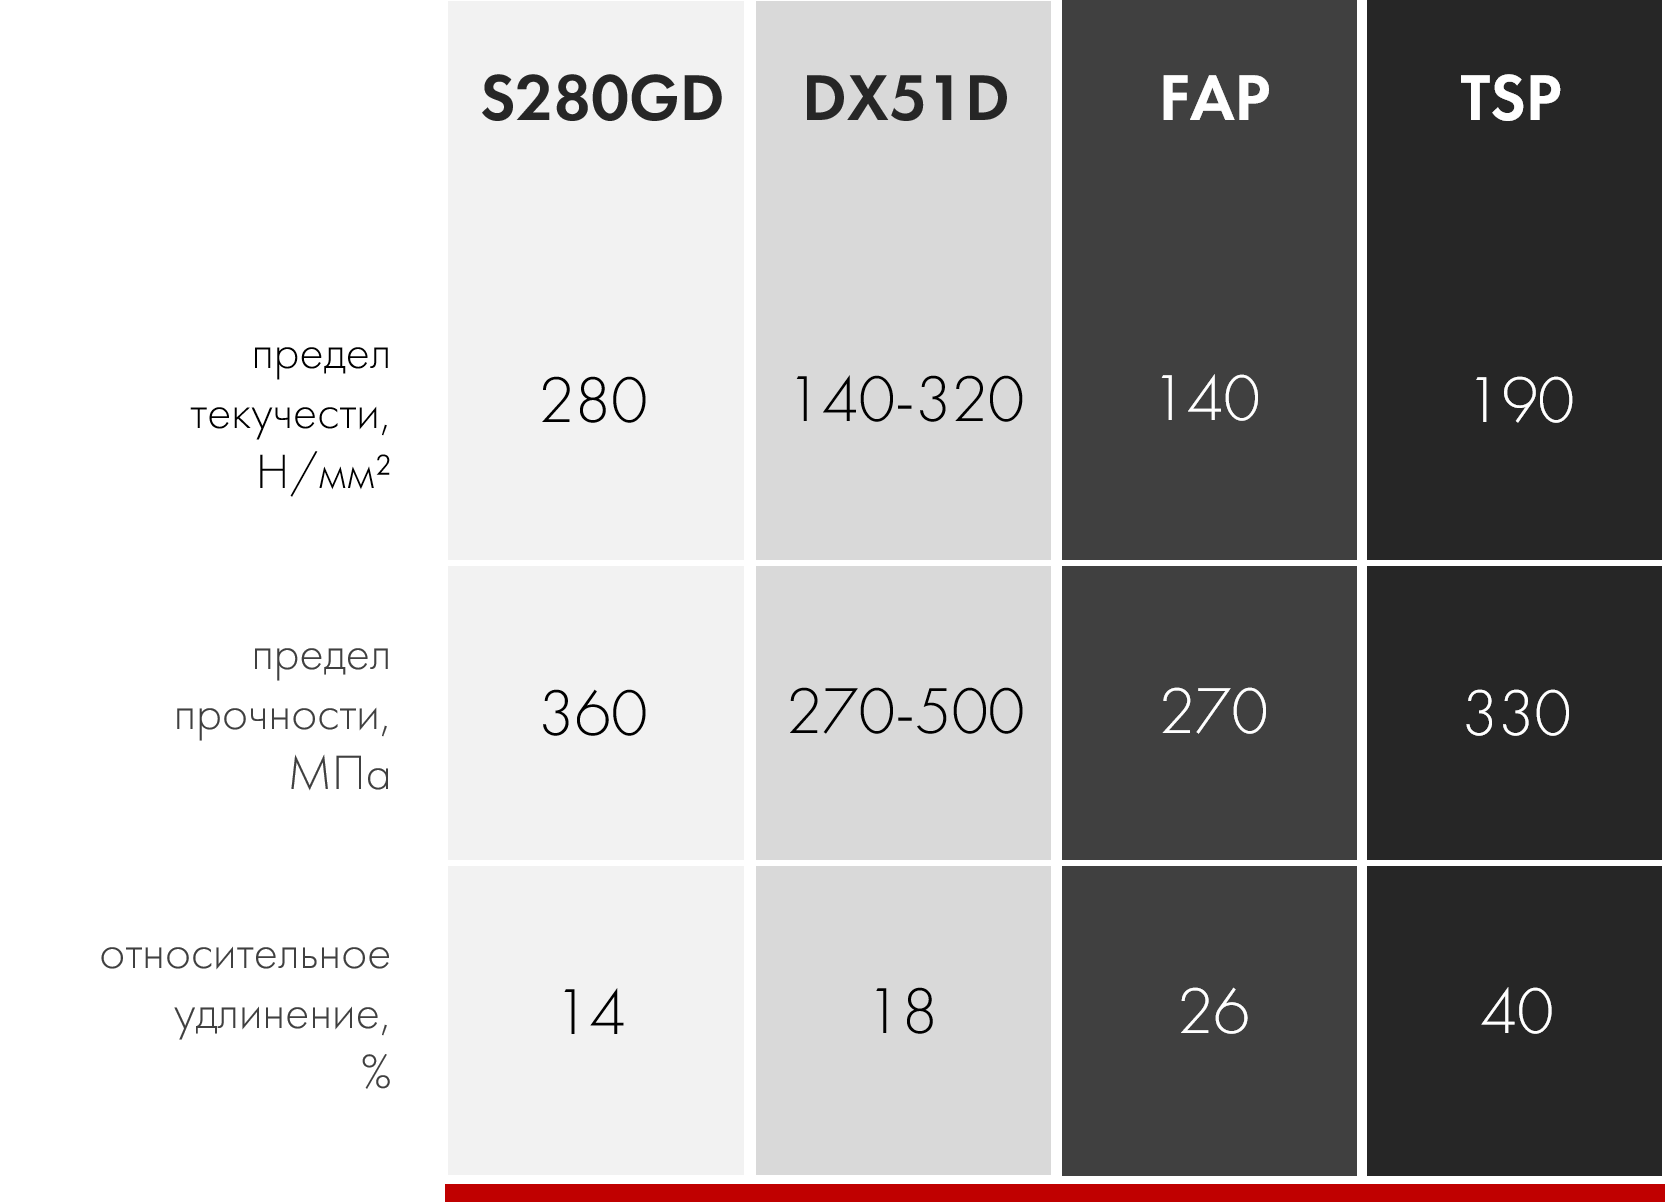 tsp fap s280gd dx51d